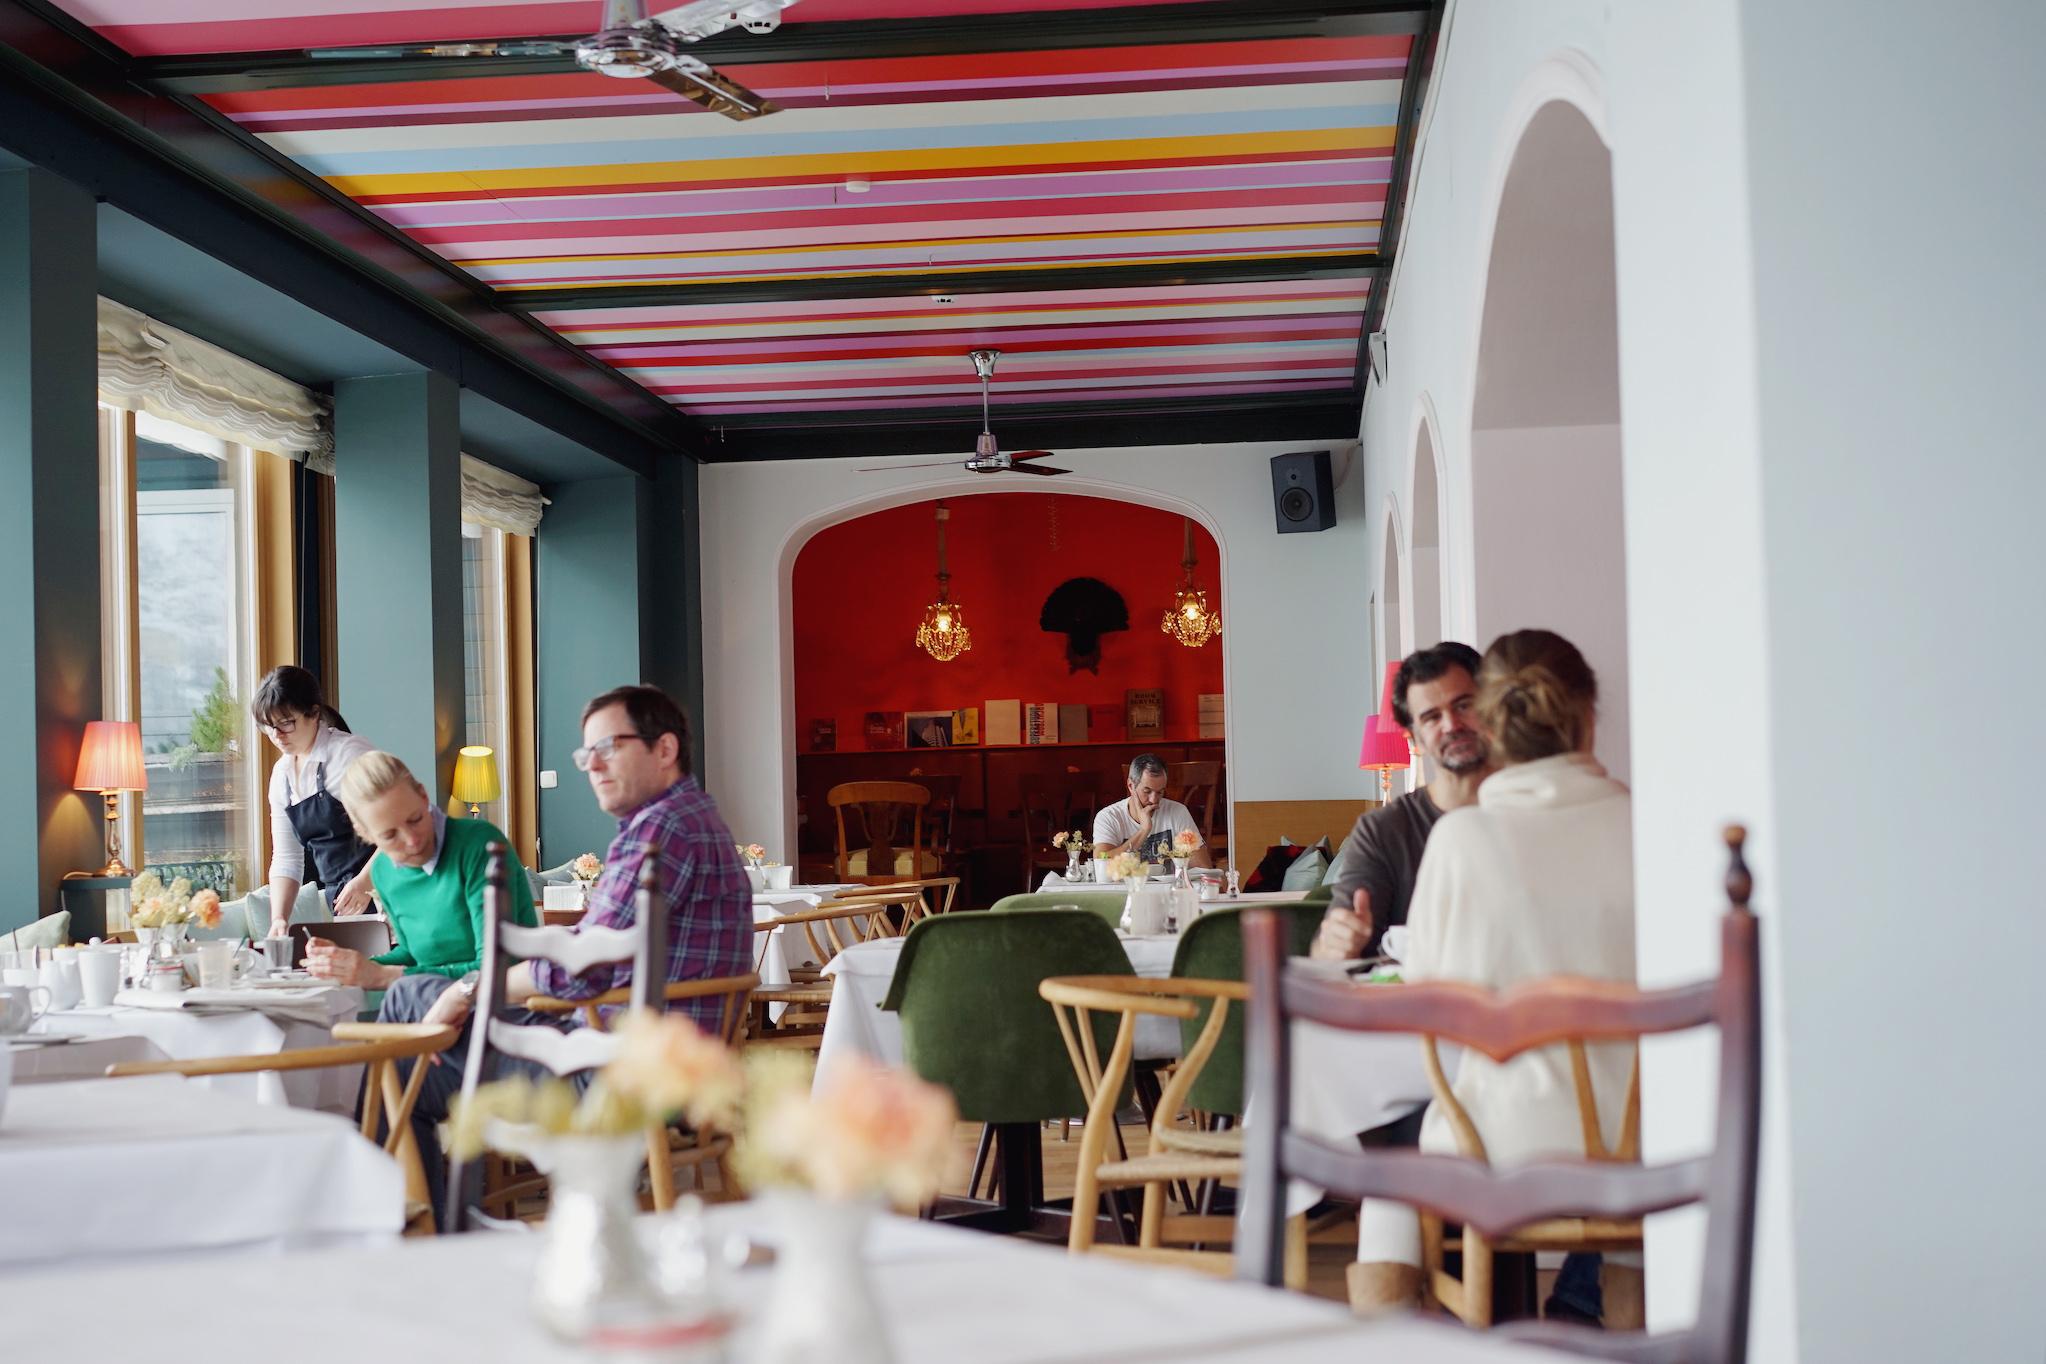 2017-04-Haus-Hirt - haus-hirt-bad-gastein-nectarandpulse-breakfast-55.jpg